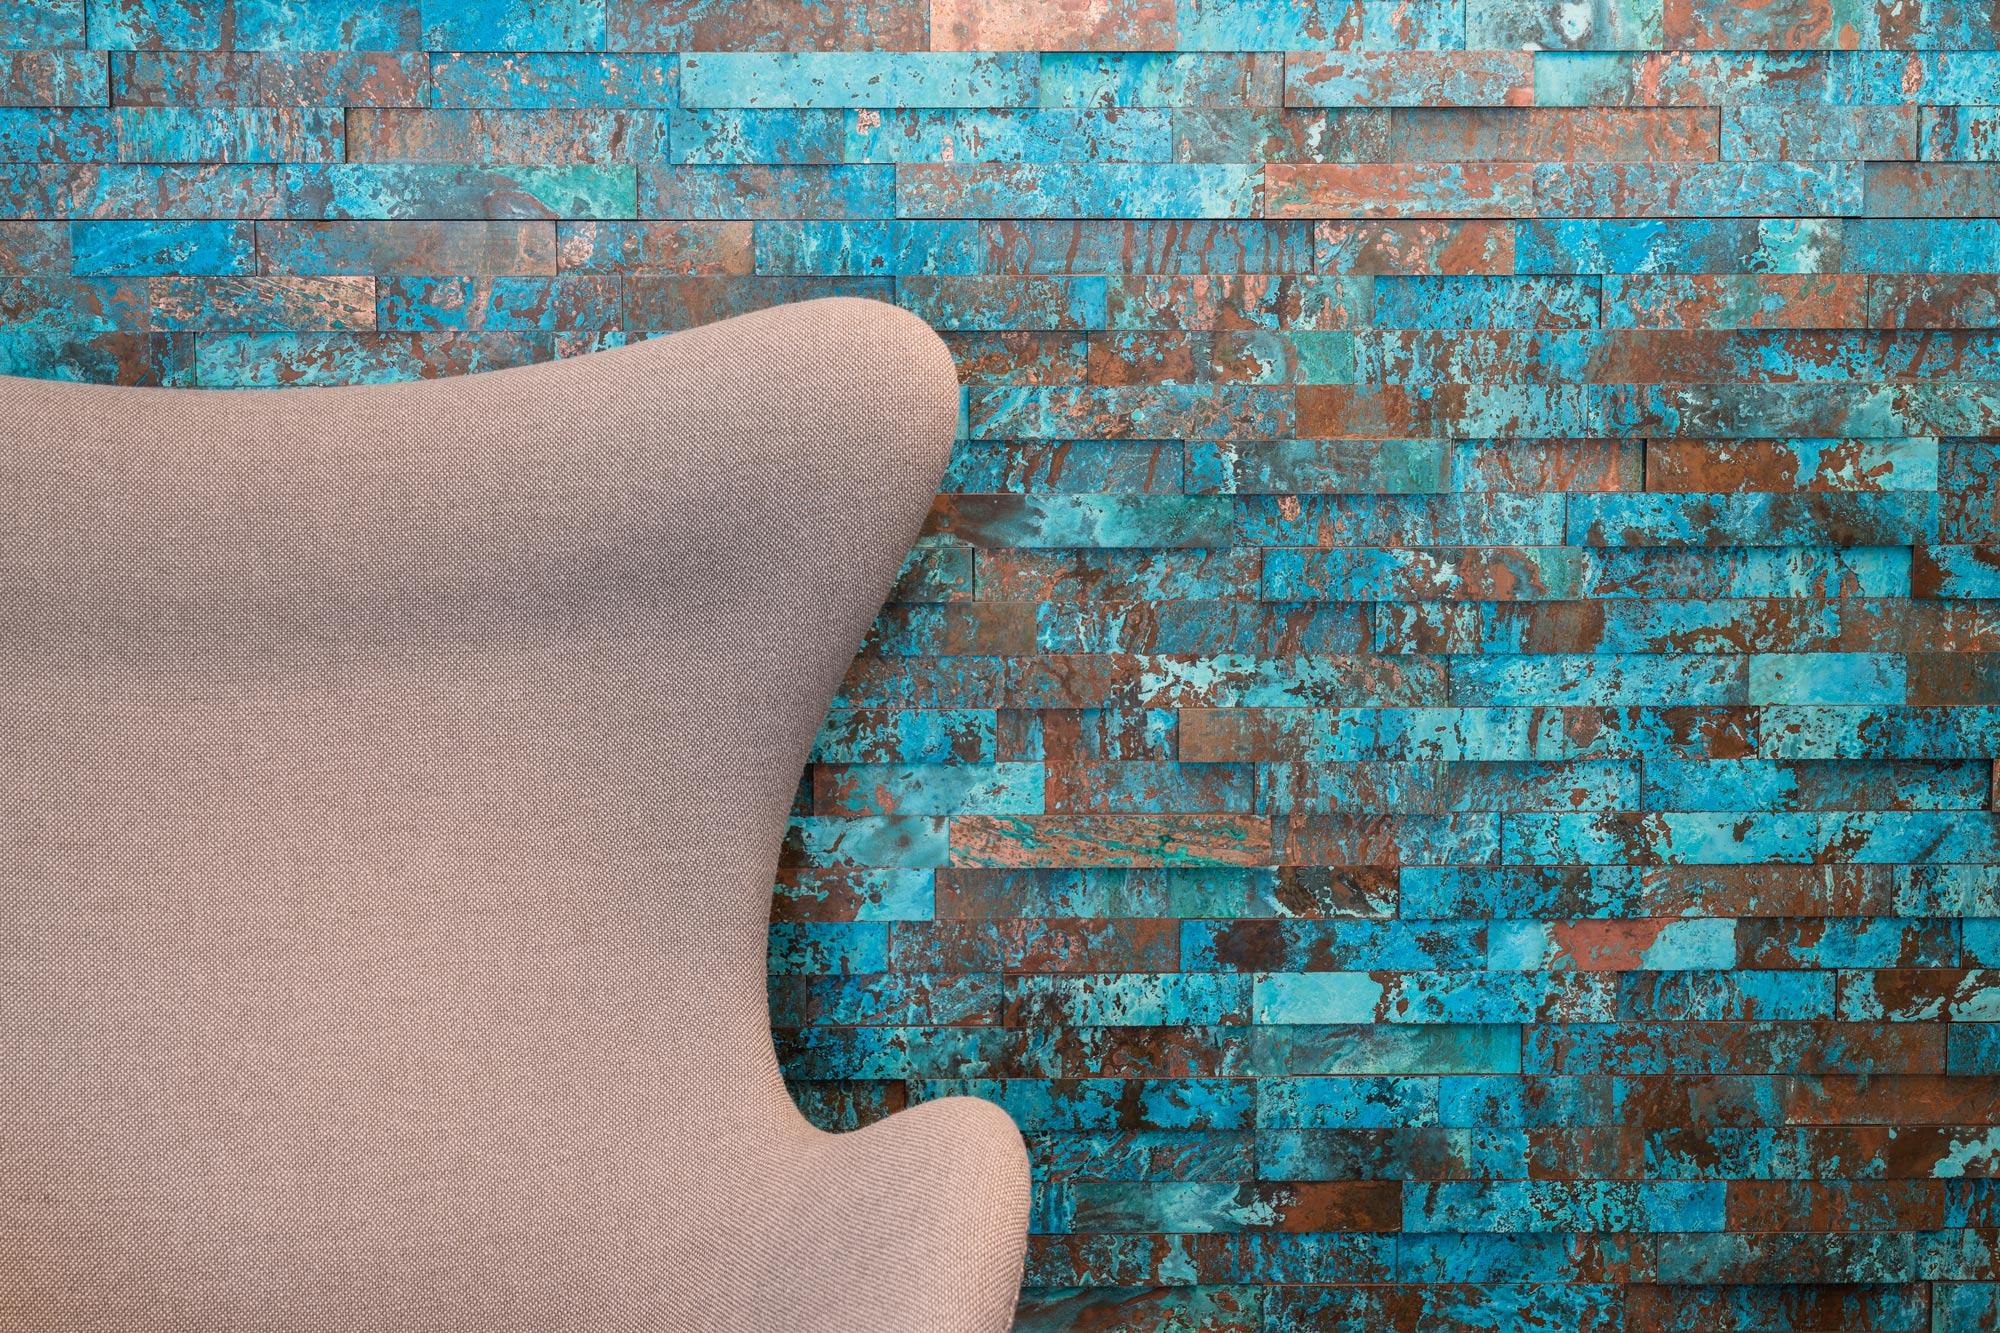 Wandpaneele-Impressionen---Projekt-Triton-im-Frankfurter-Omniturm-2